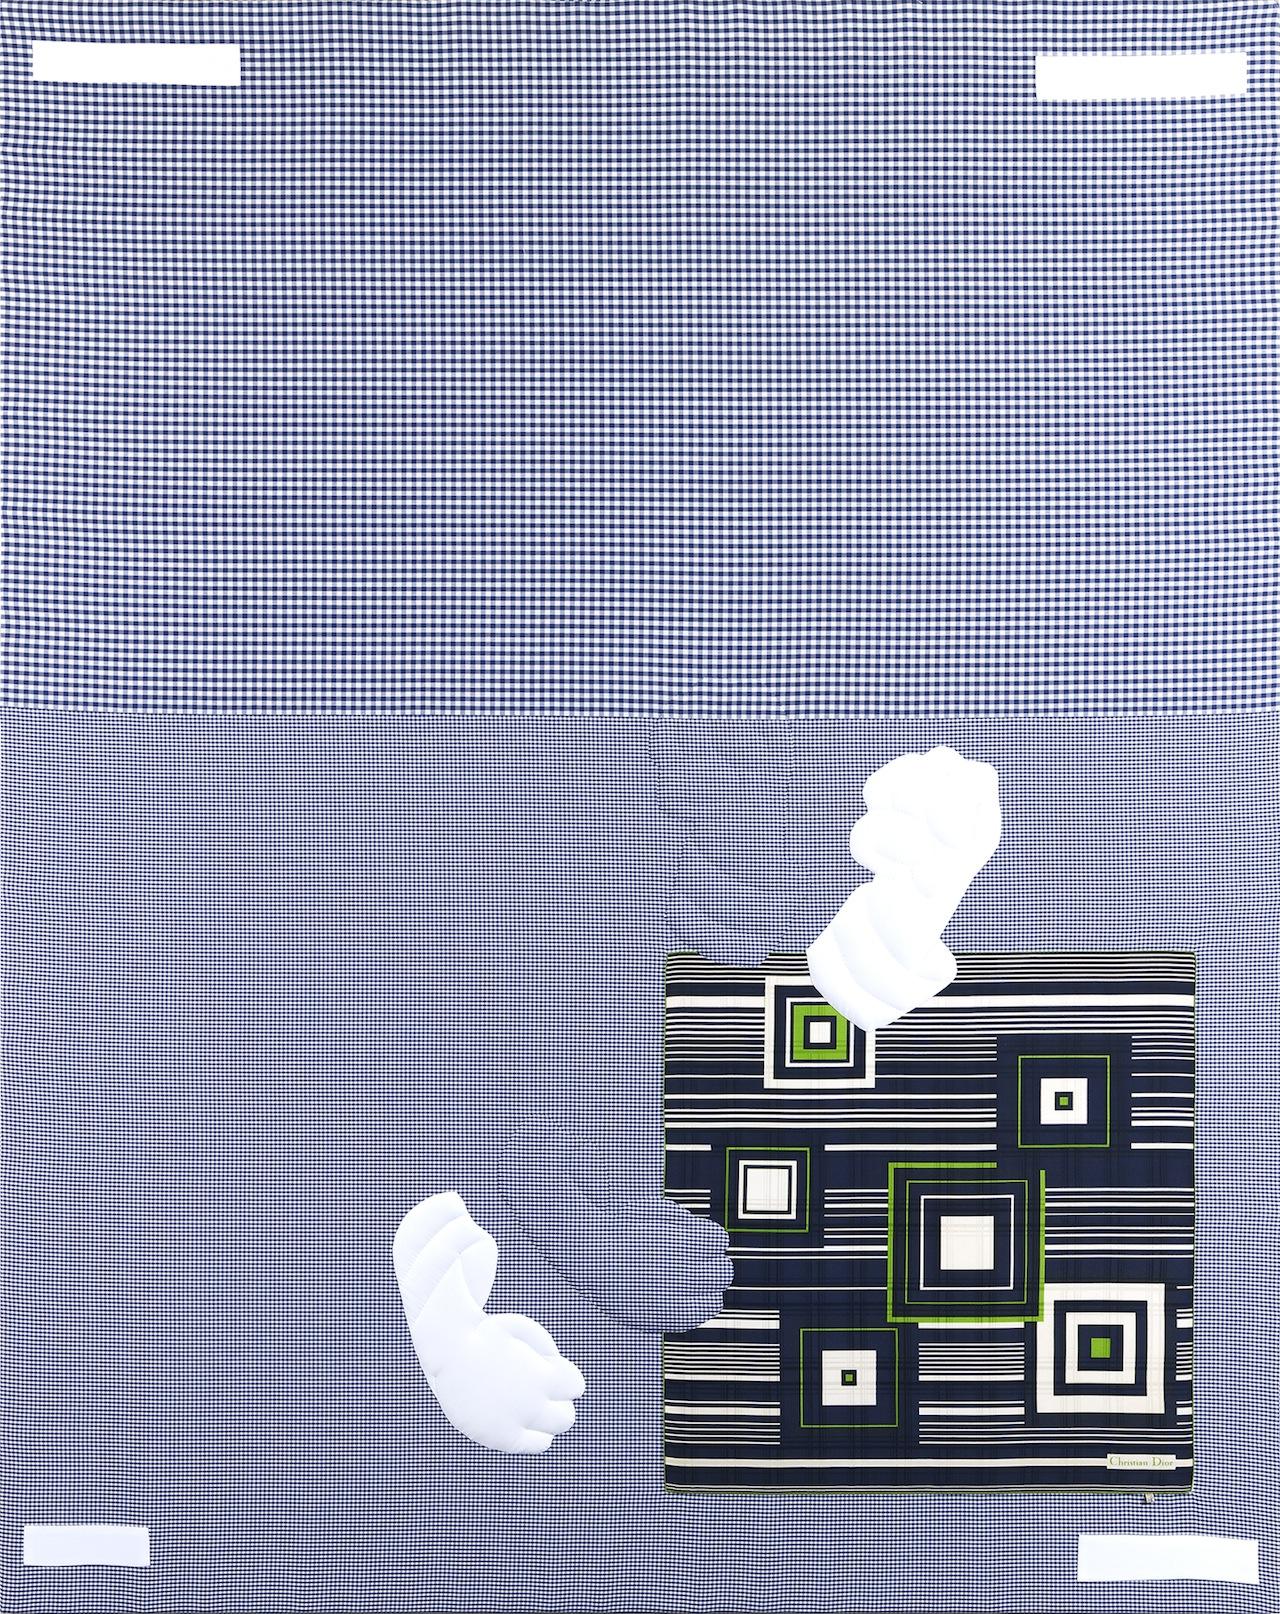 "Cosmia von Bonin, ""NON-ZERO ENTHUSIASM"" (2009), cotton, silk, fleece, 90.55 x 79.92 inches"